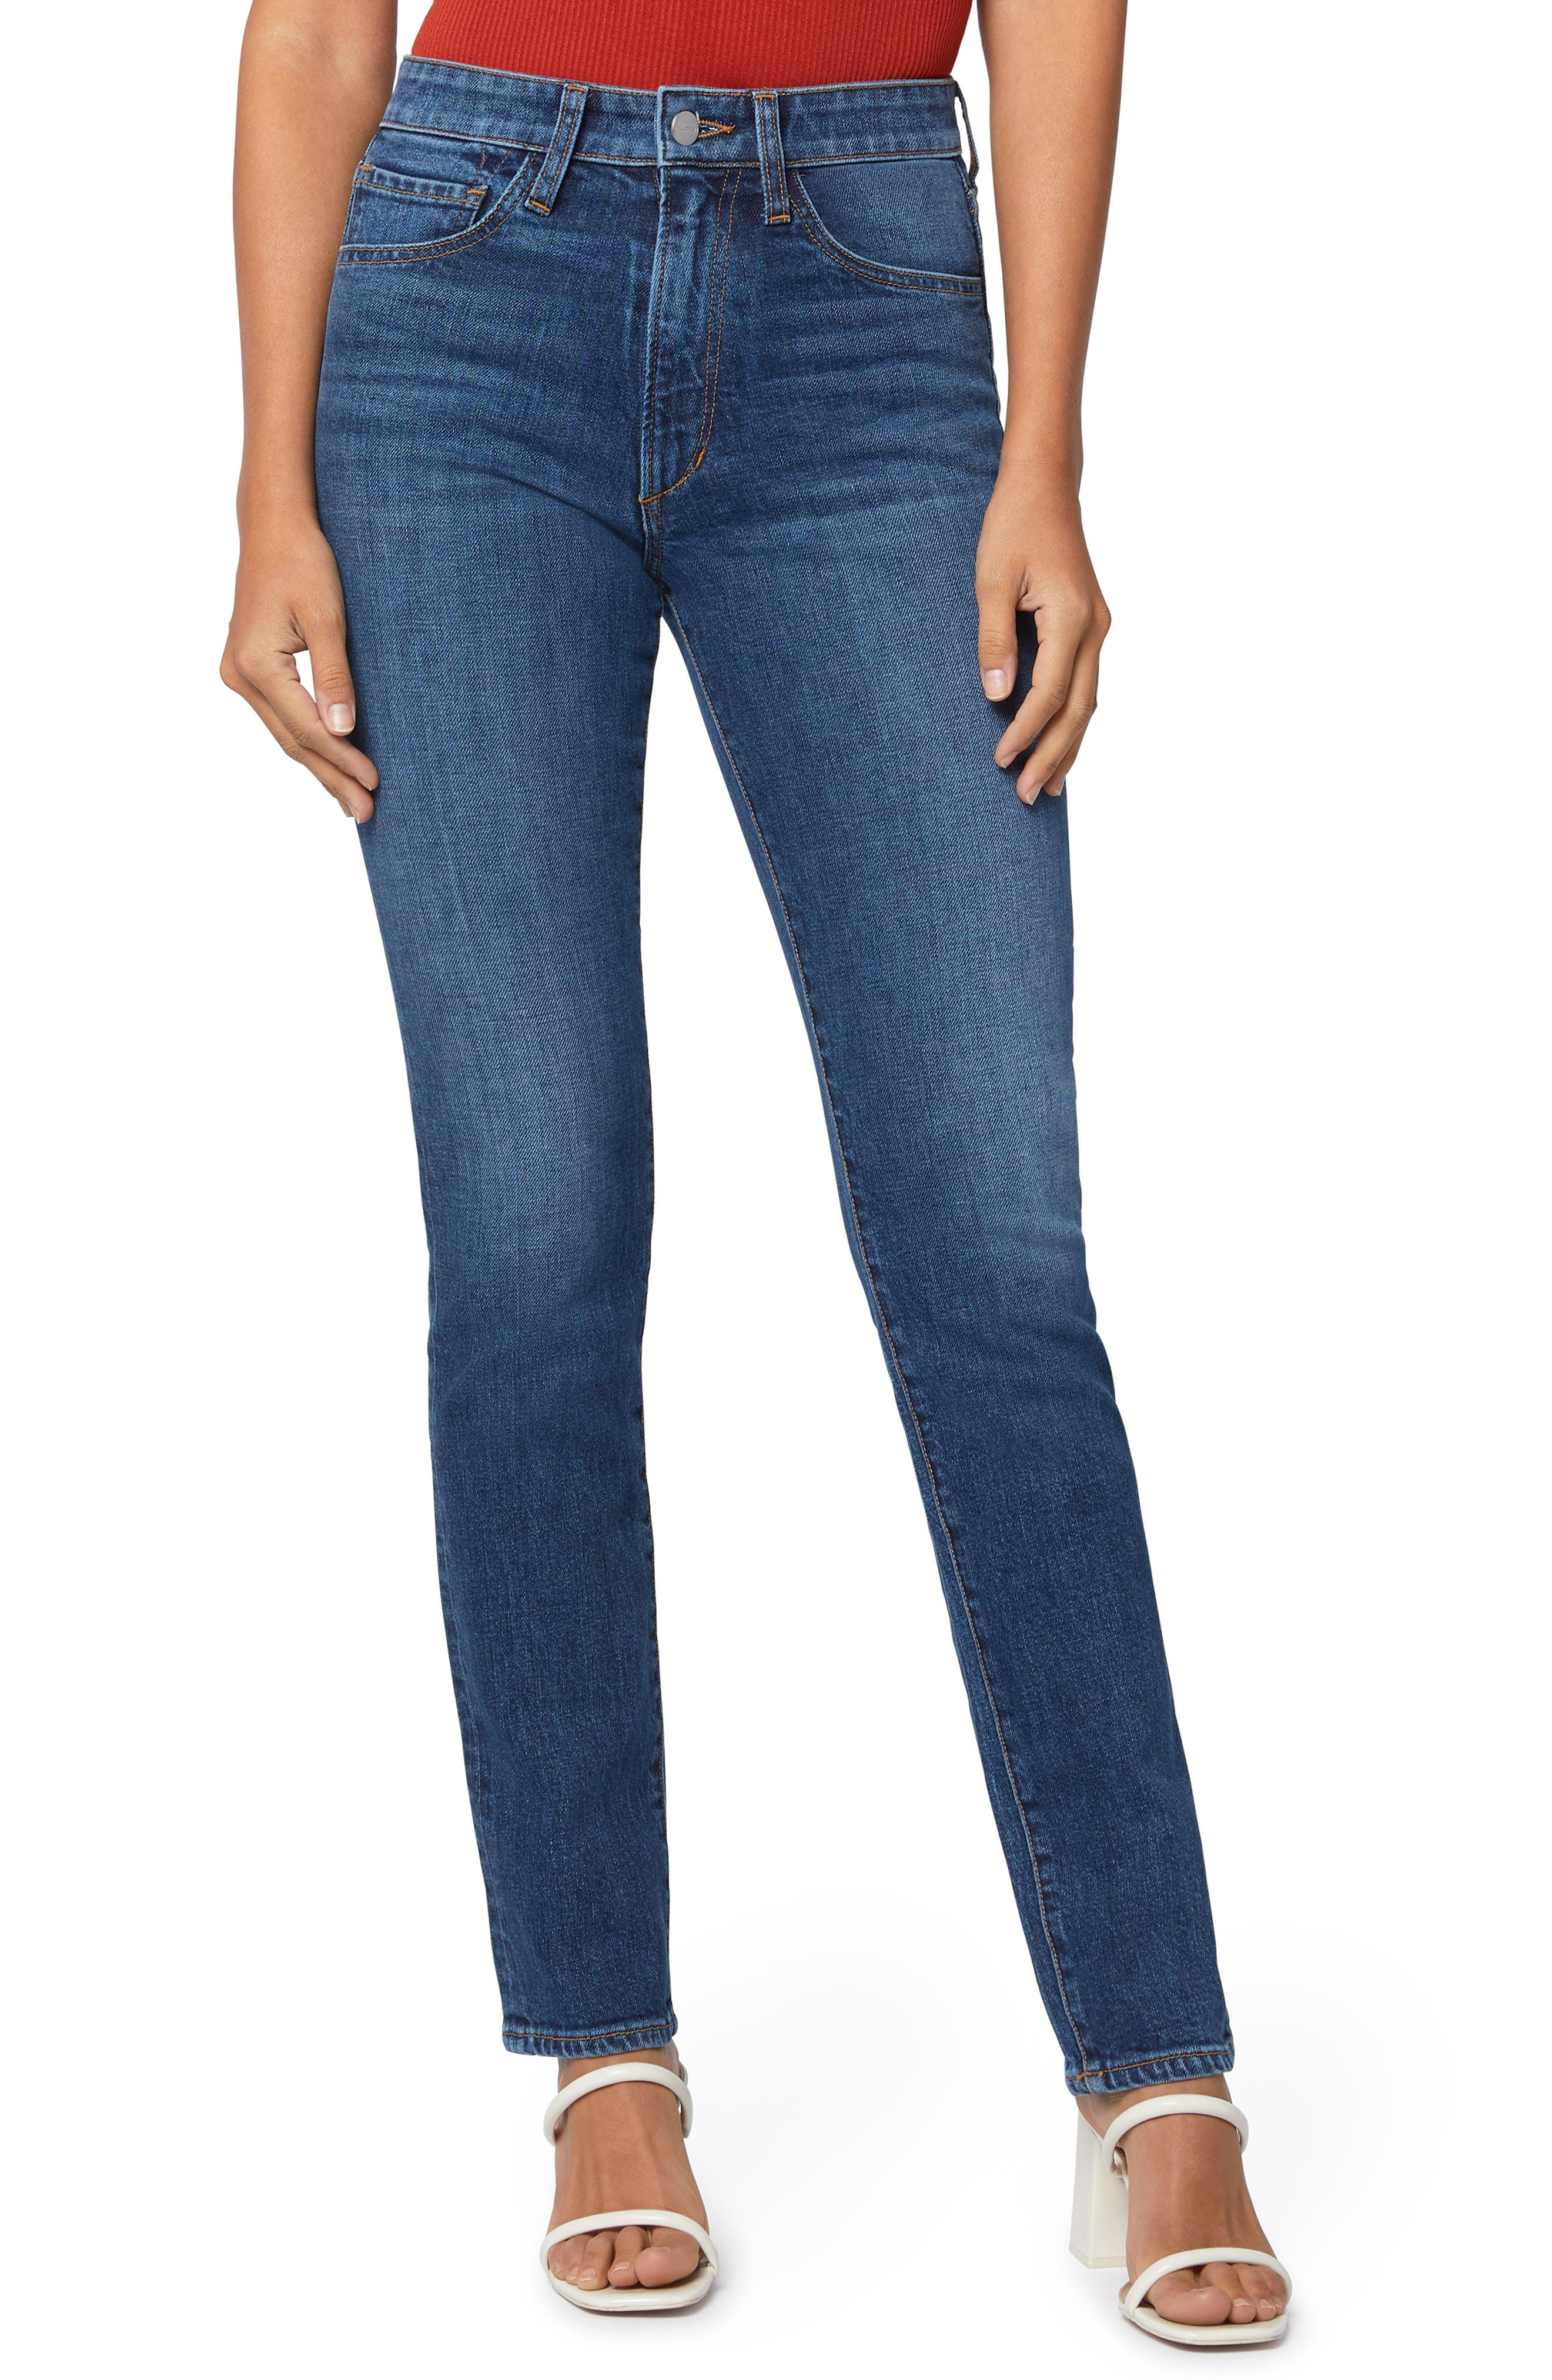 Image of Joe's Jeans The Luna High Waist Cigarette Jeans